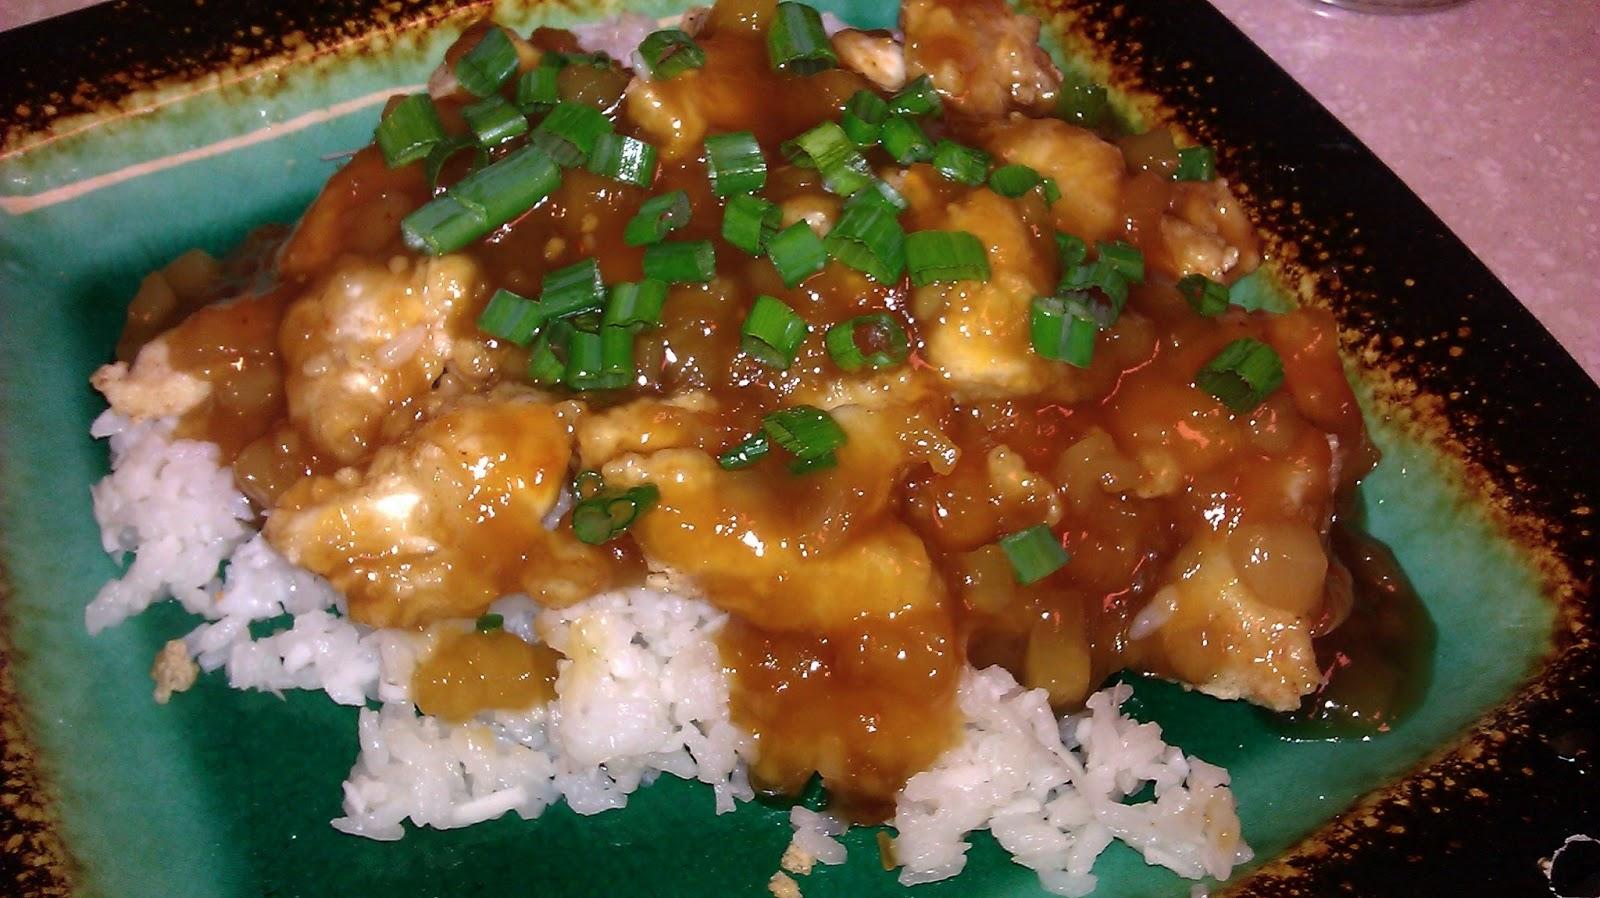 Gluten Free Casually: General Tso's Chicken